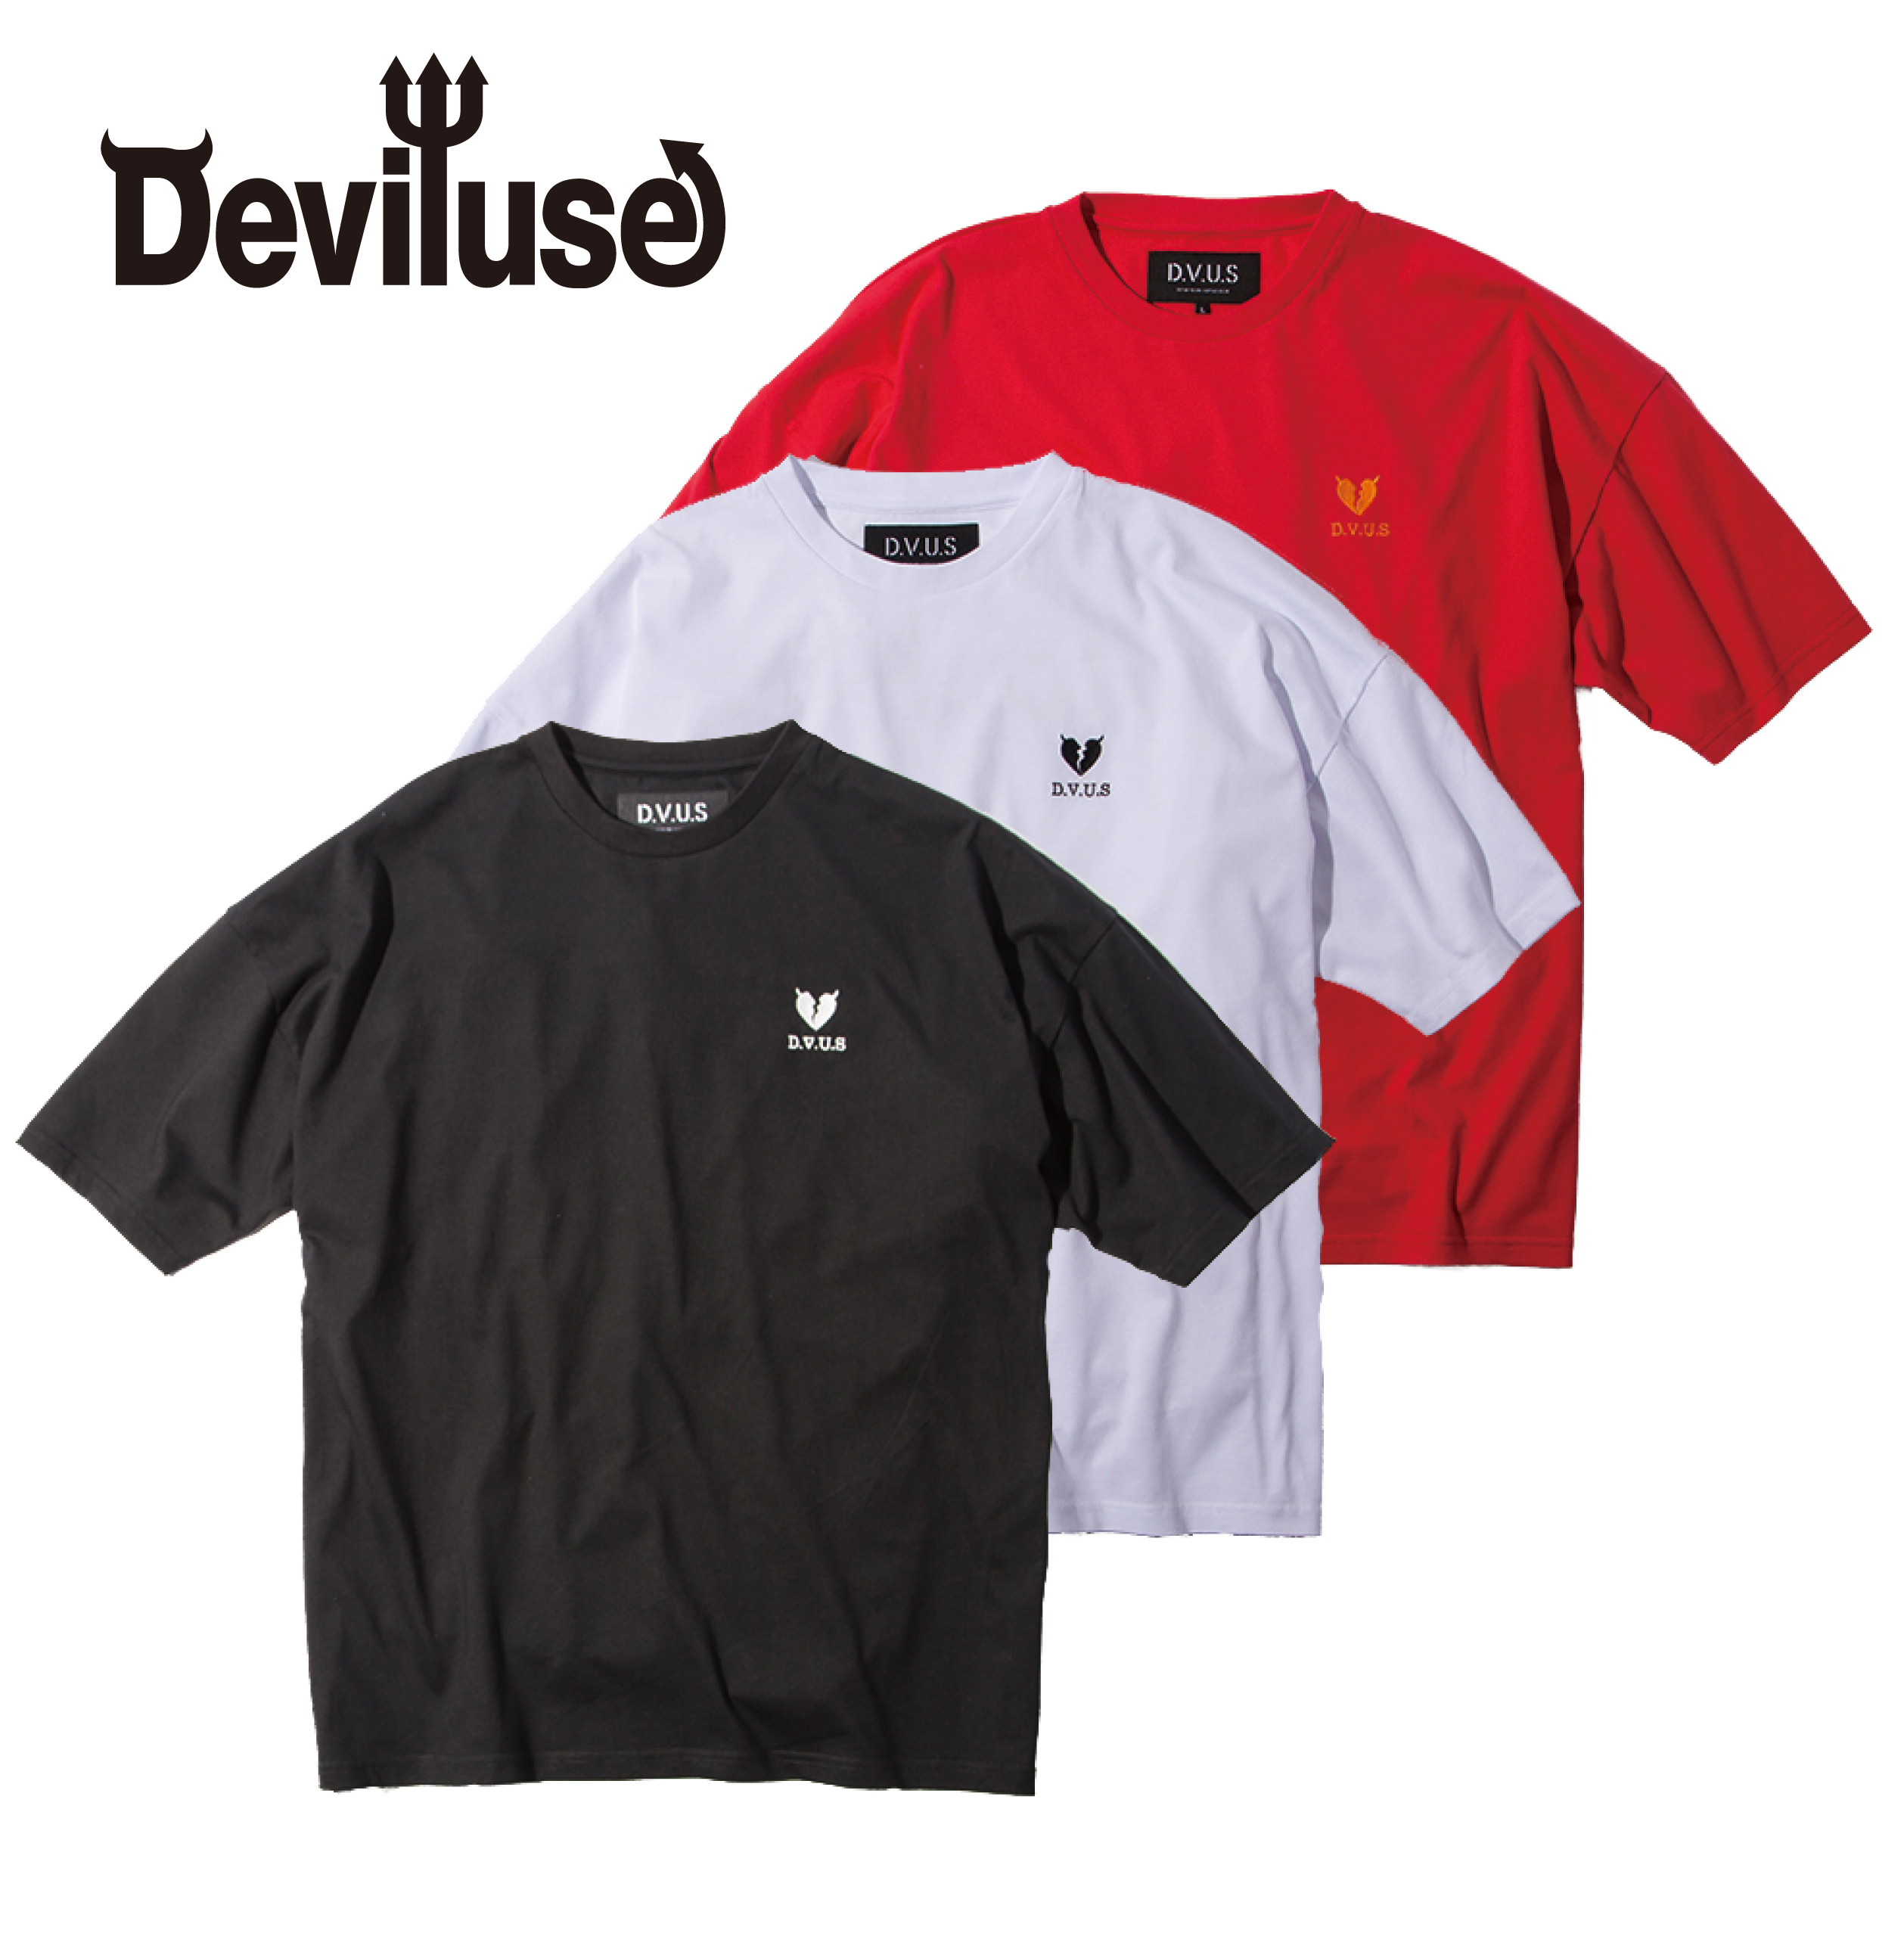 Deviluse(デビルユース) | Heartaches Big T-shirts